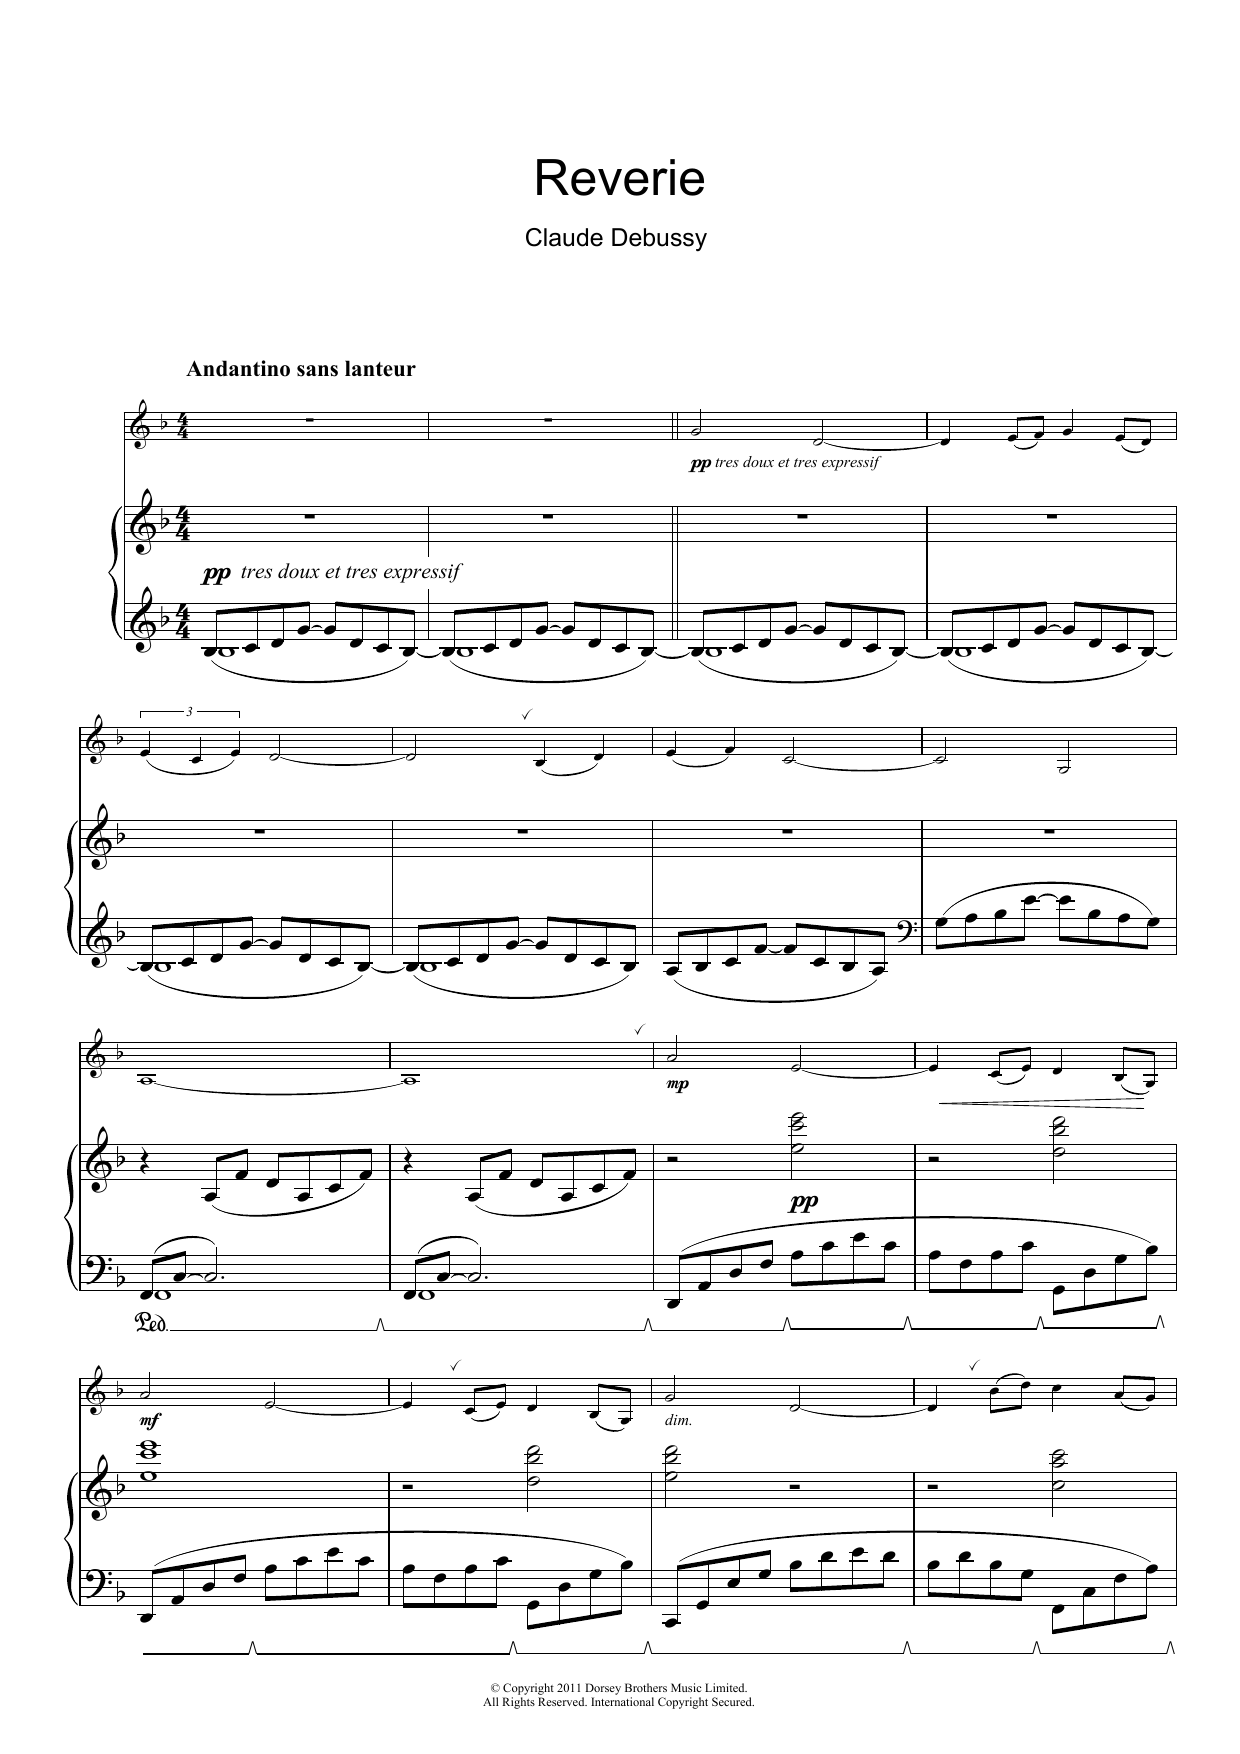 claude debussy reverie sheet music pdf